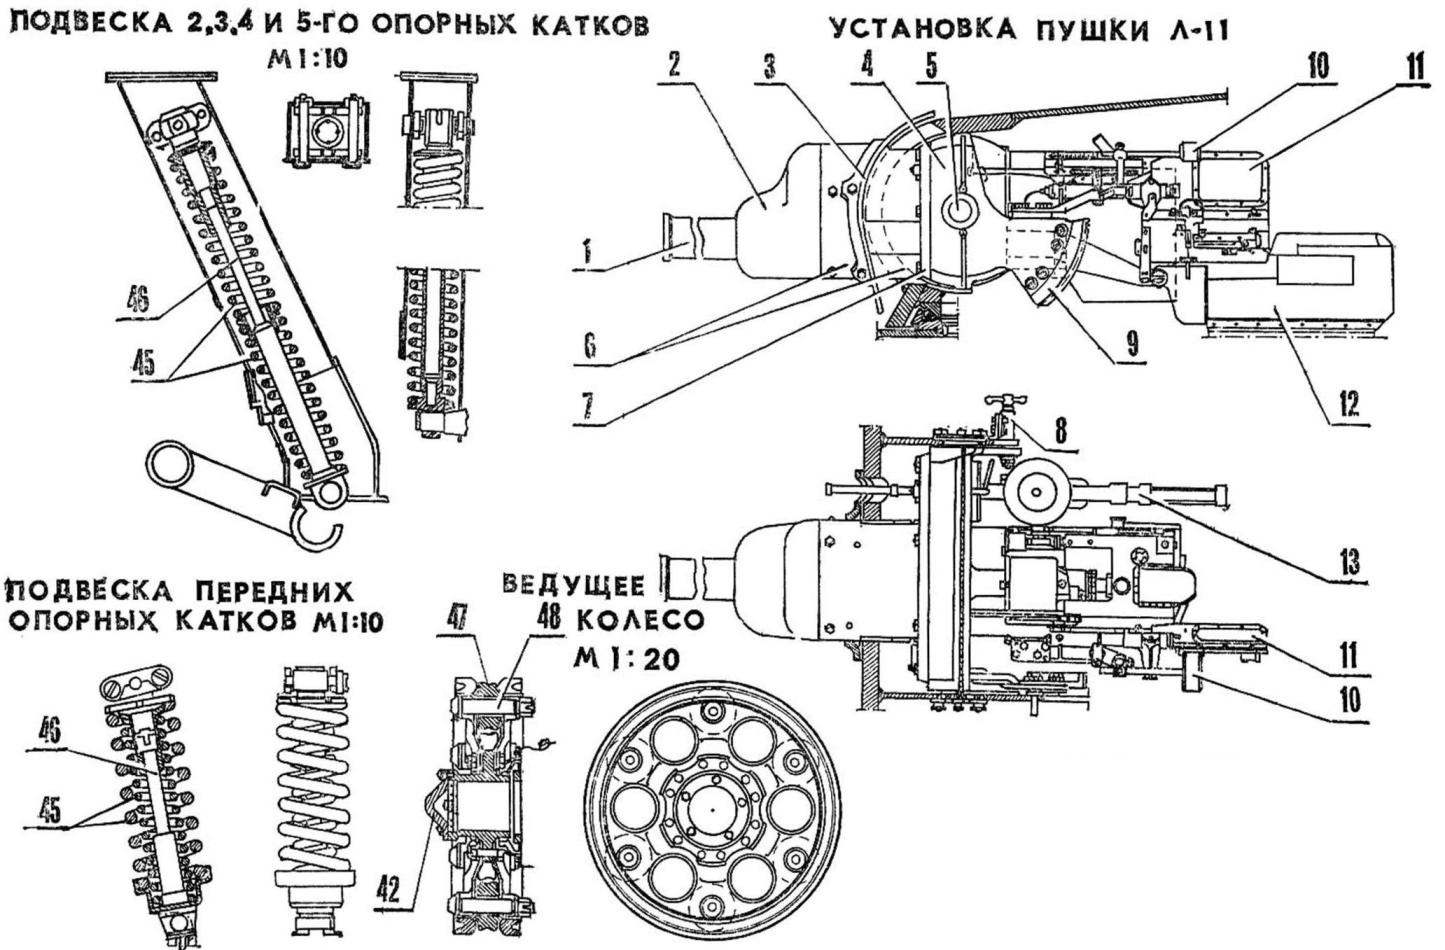 76-мм пушка Л-11 образца 1939 г.